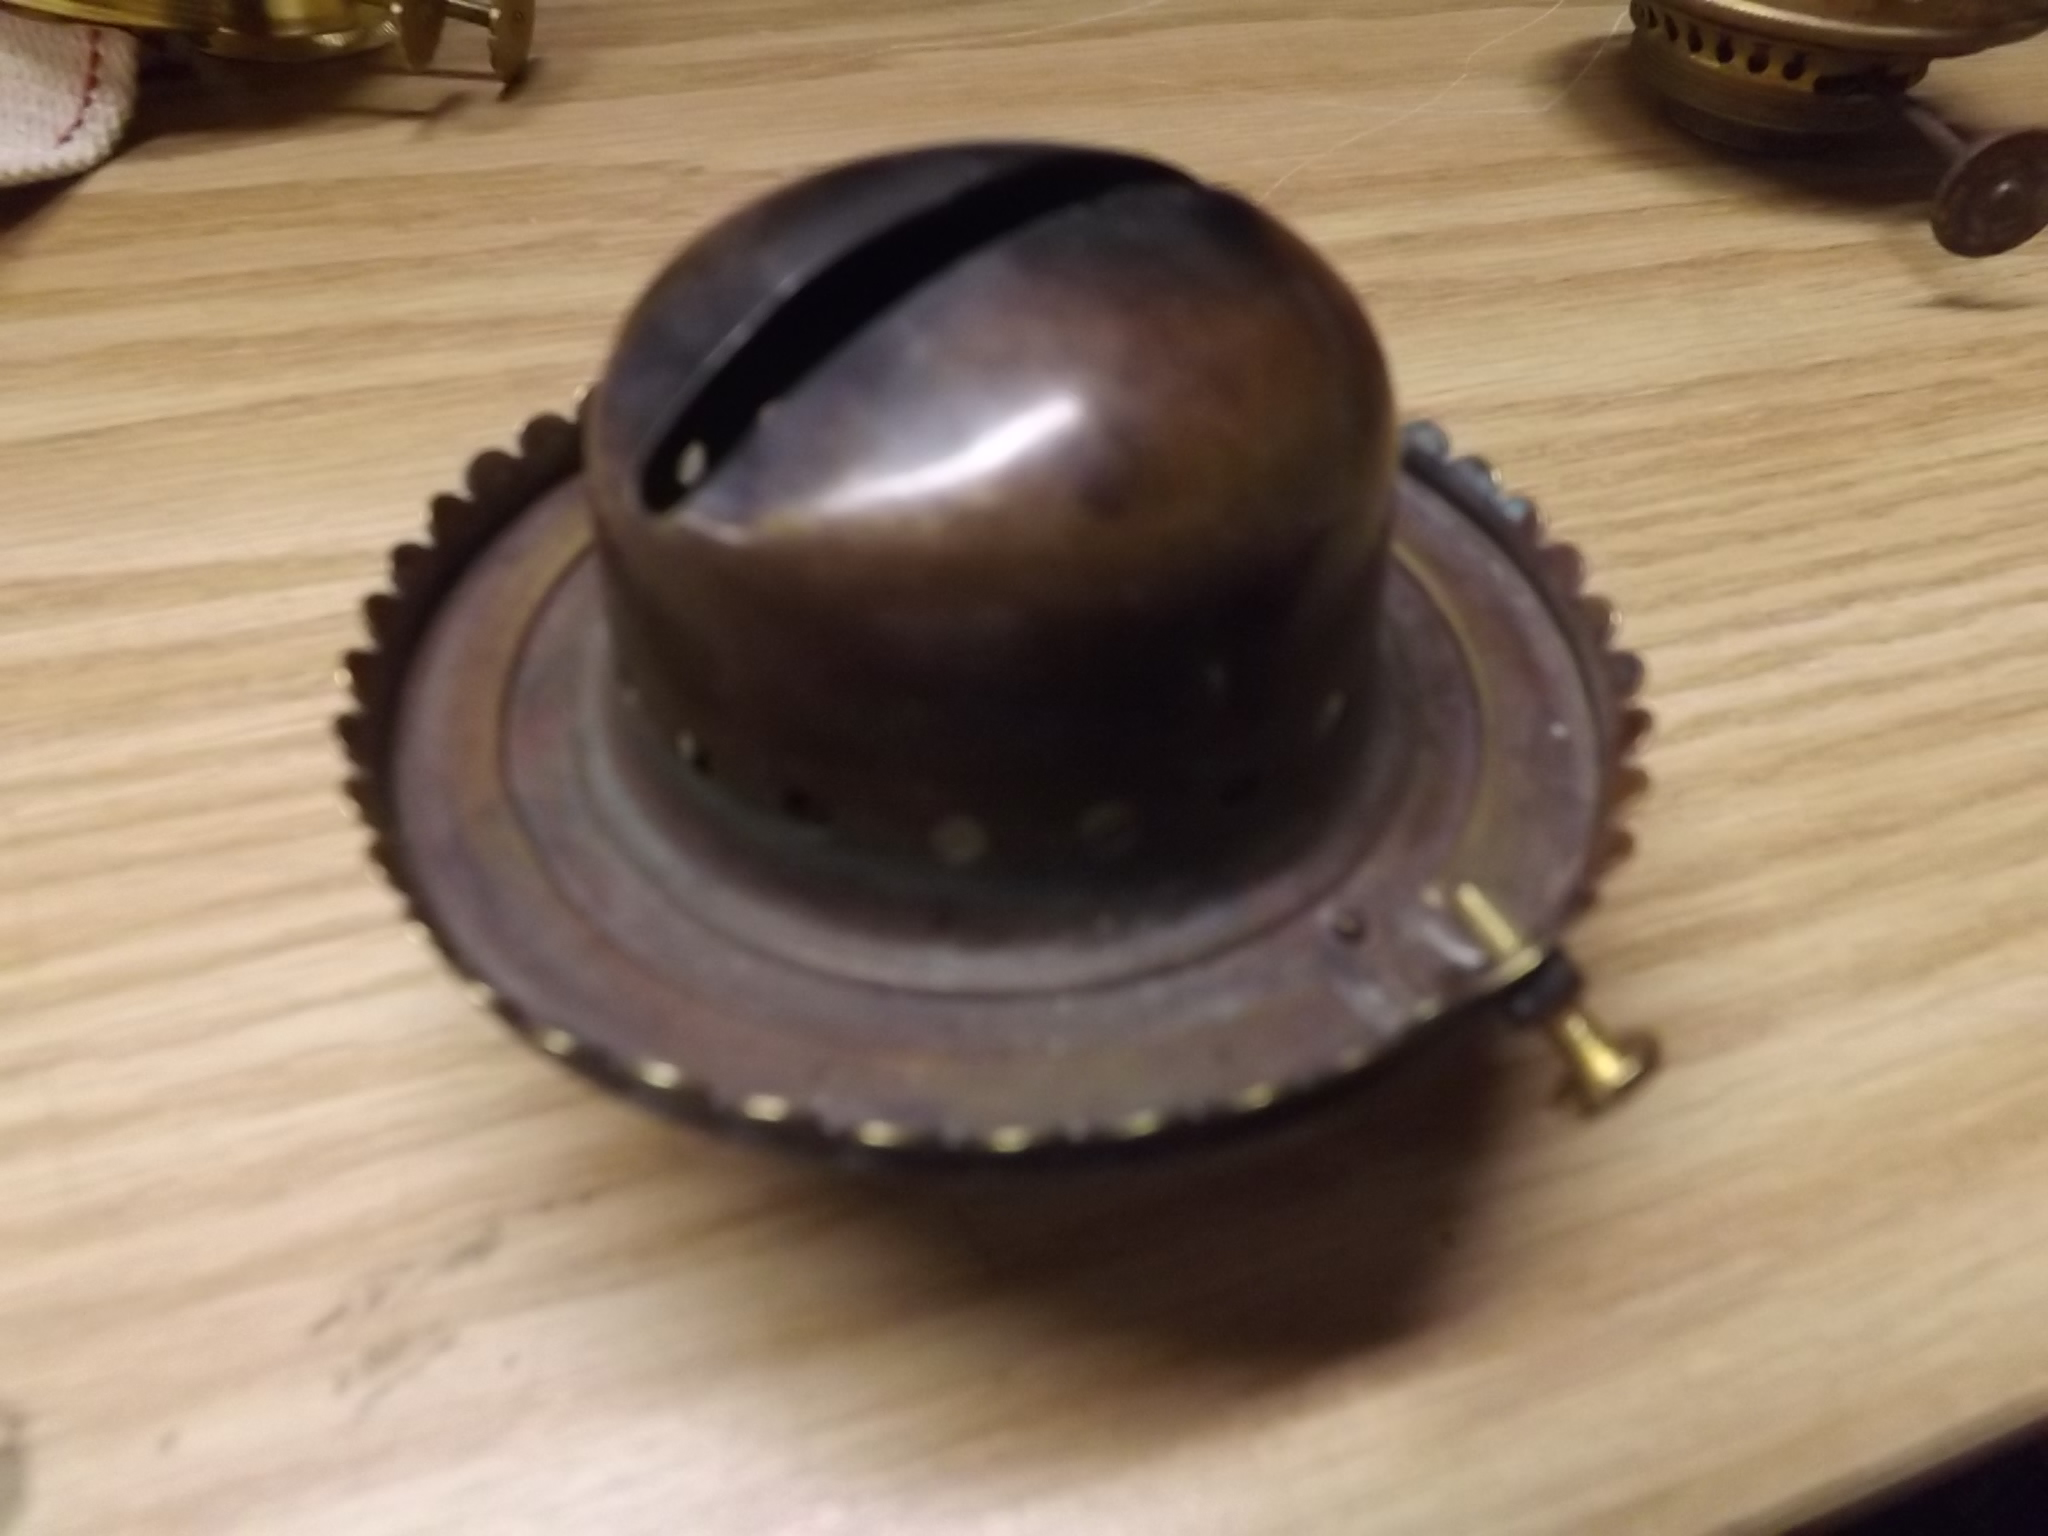 Old Style Coronet uses lip chimneys - note setscrew